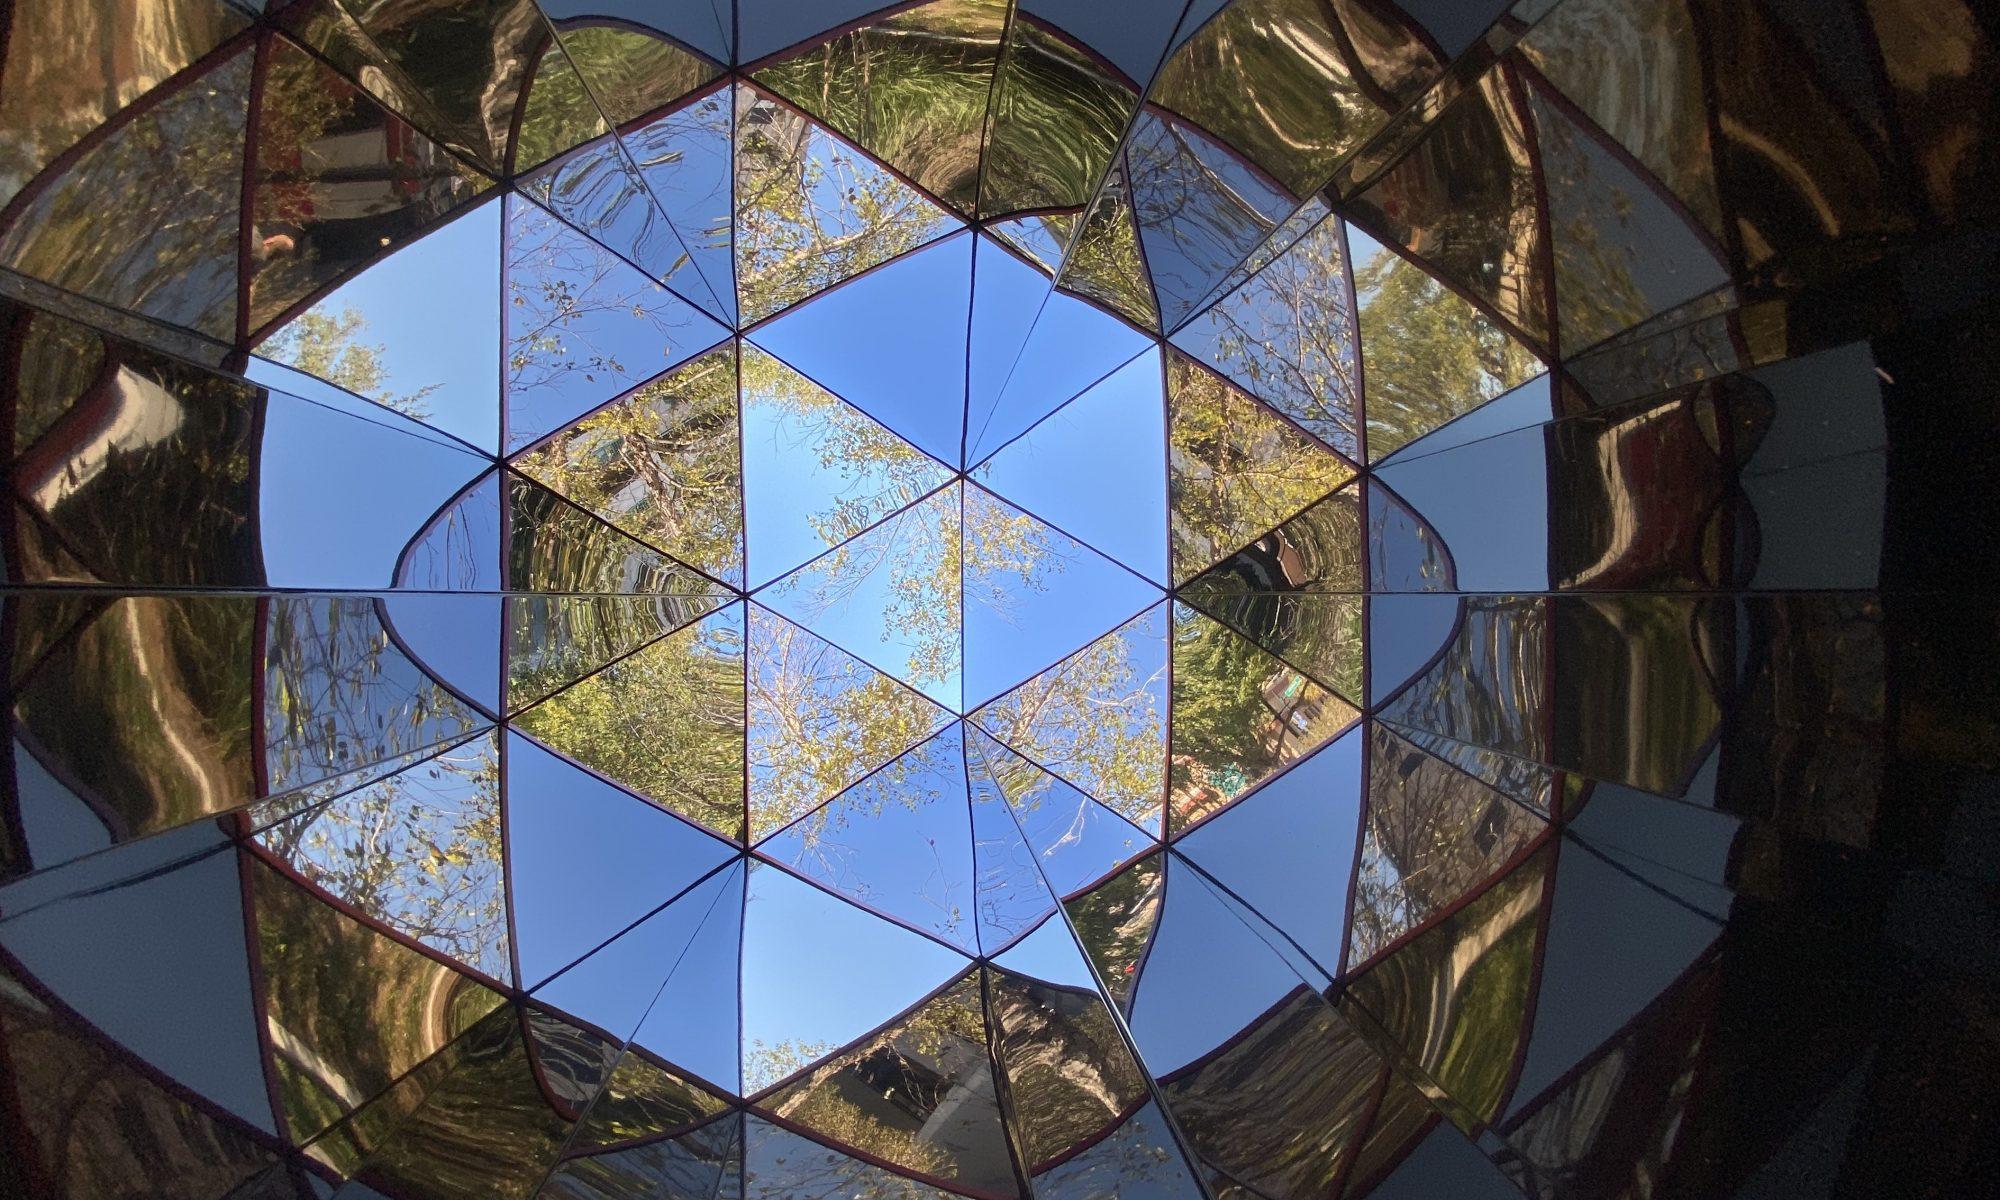 Jaxoscope - a public art kaleidoscope sculpture